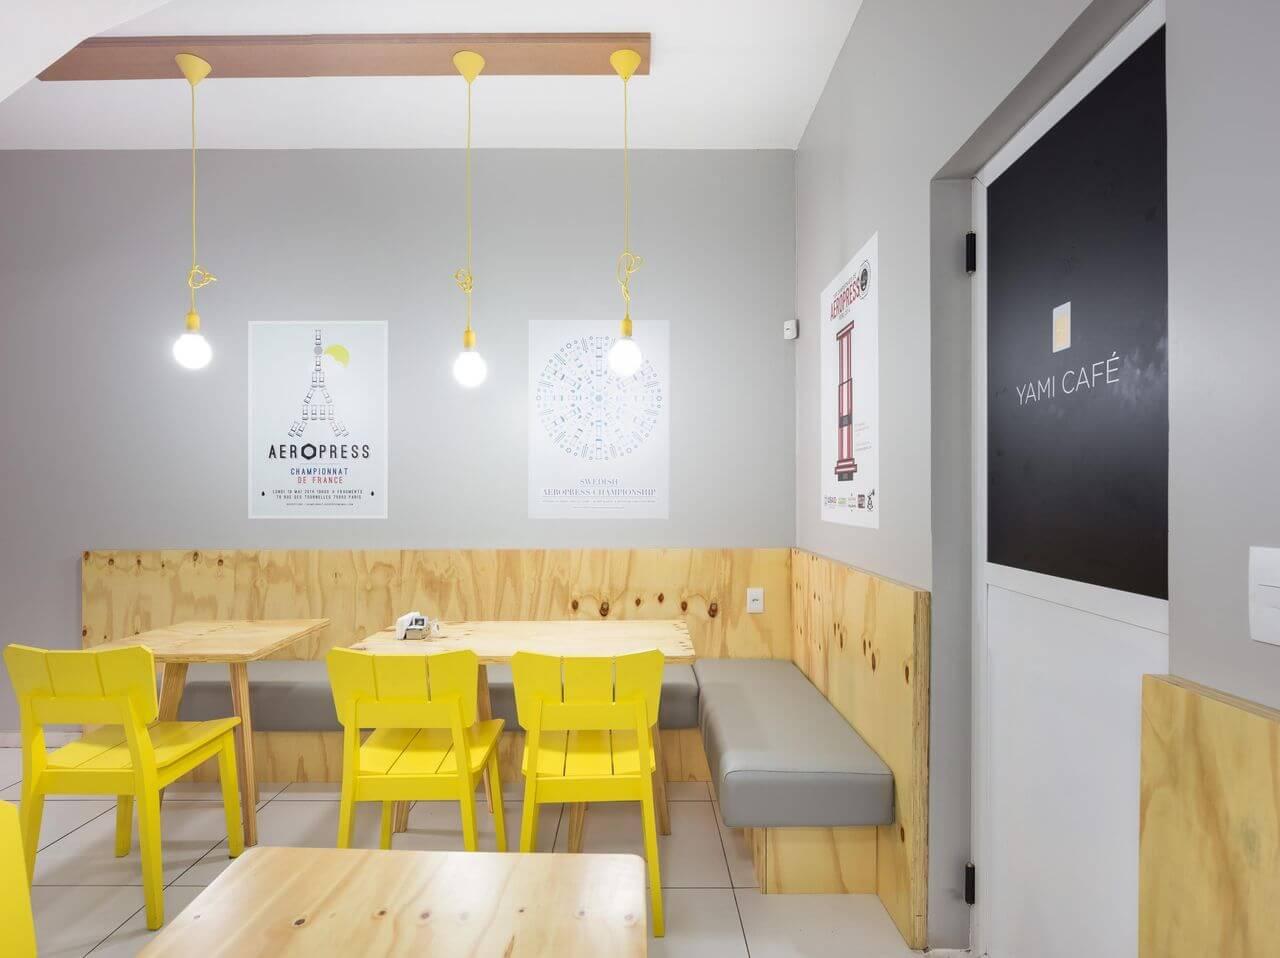 tipos de lâmpadas - pendente amarelo